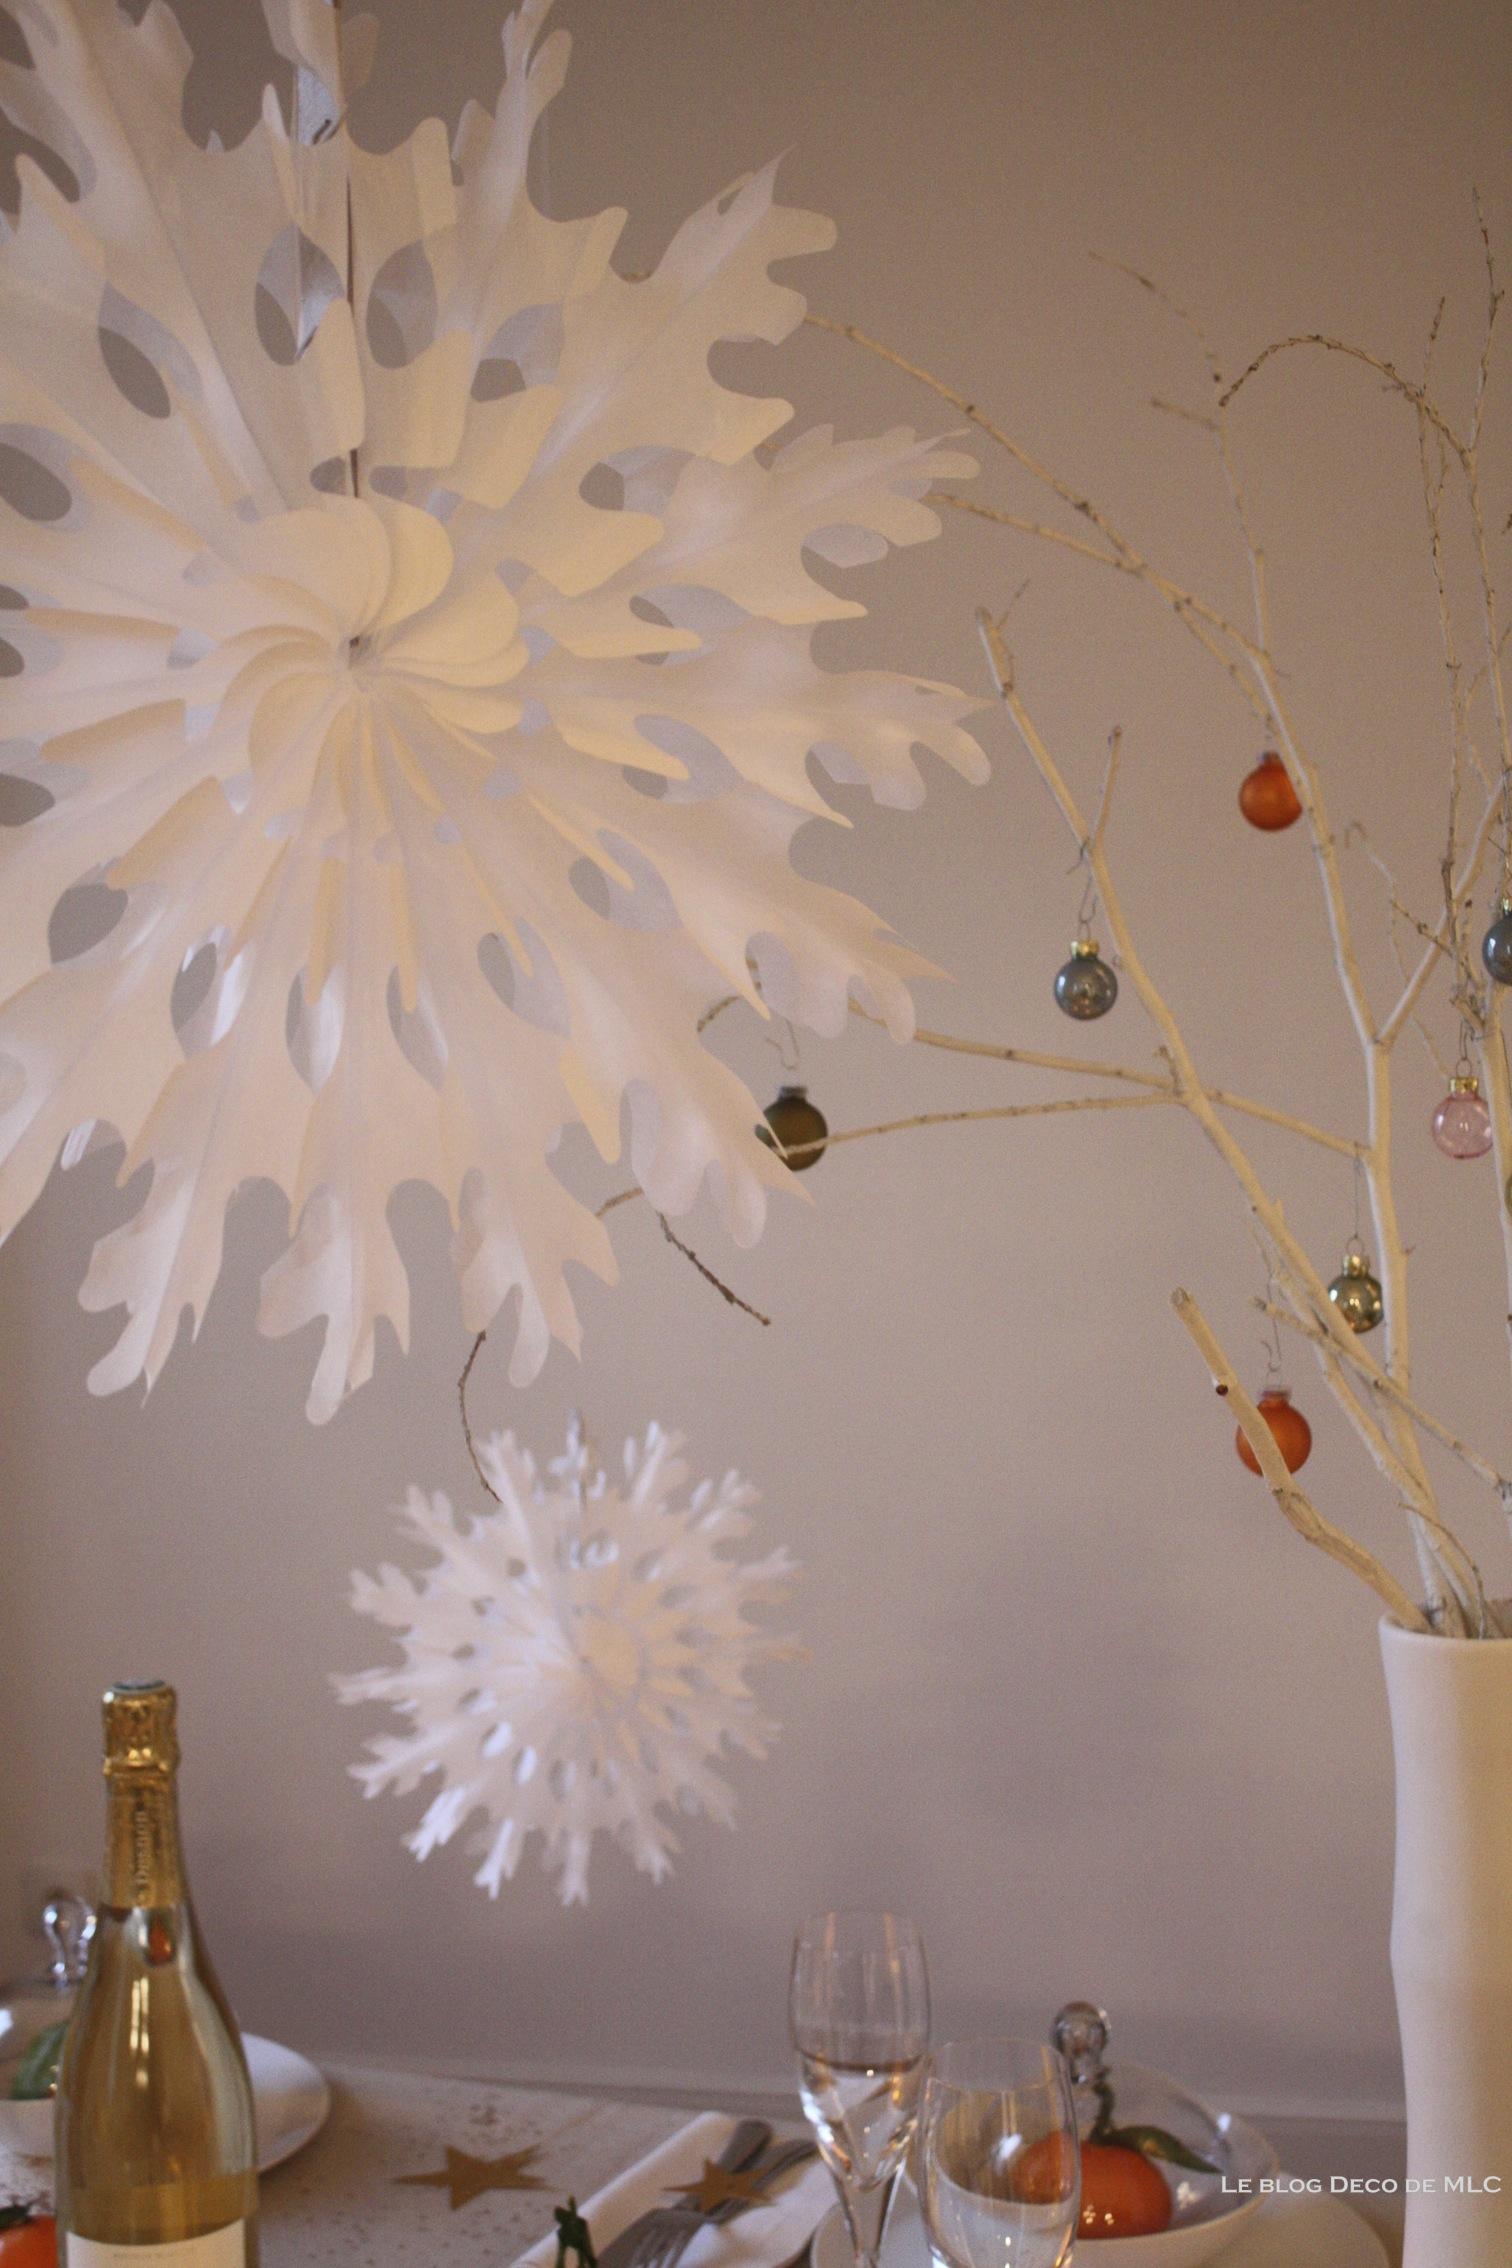 #926539 Decoration Table De Noel 6155 decoration de table de noel 2014 1512x2268 px @ aertt.com